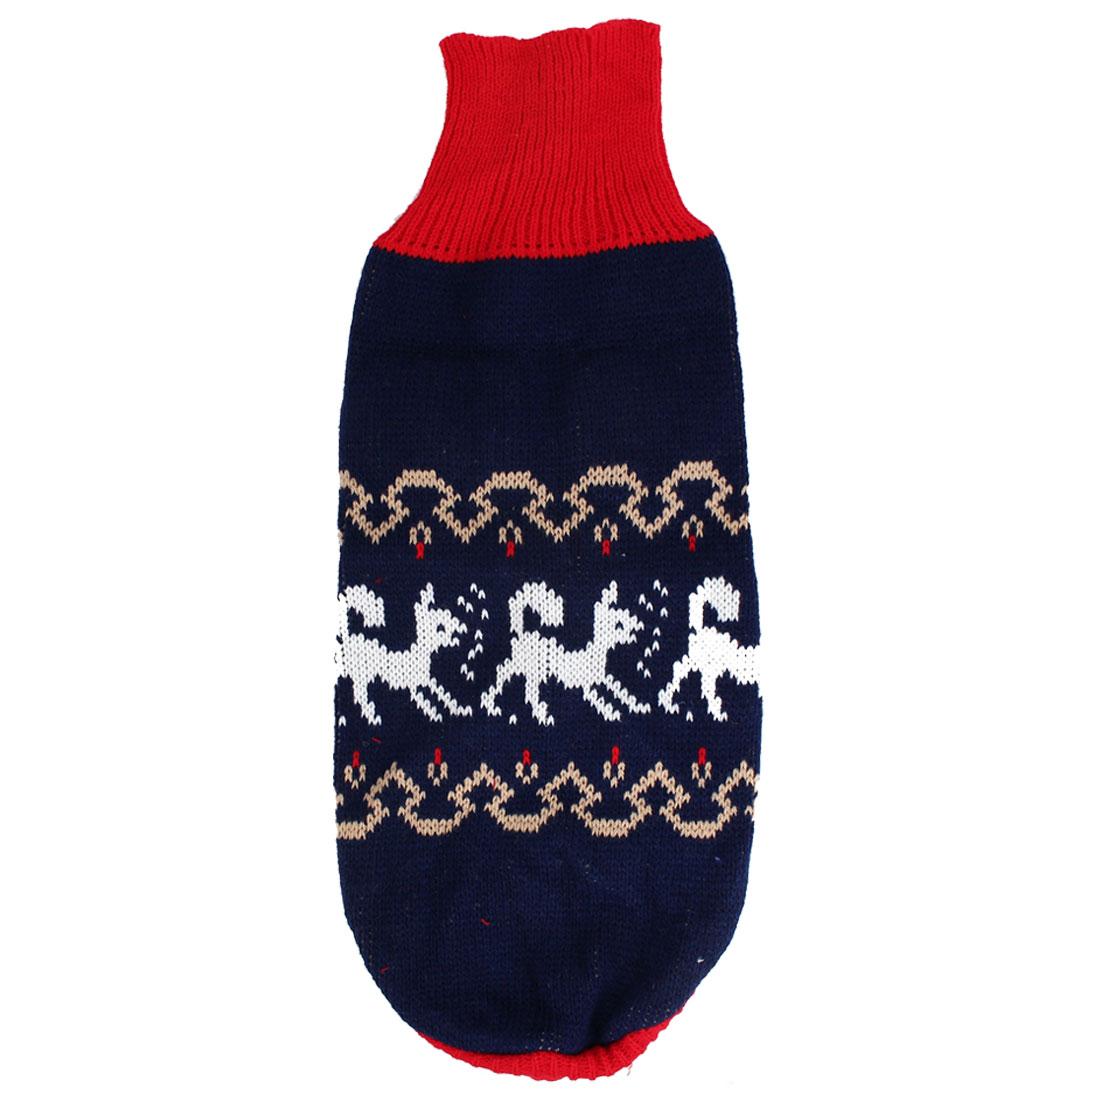 Pet Dog Ribbed Cuff Turtleneck Animal Pattern Knitwear Sweater Size 16